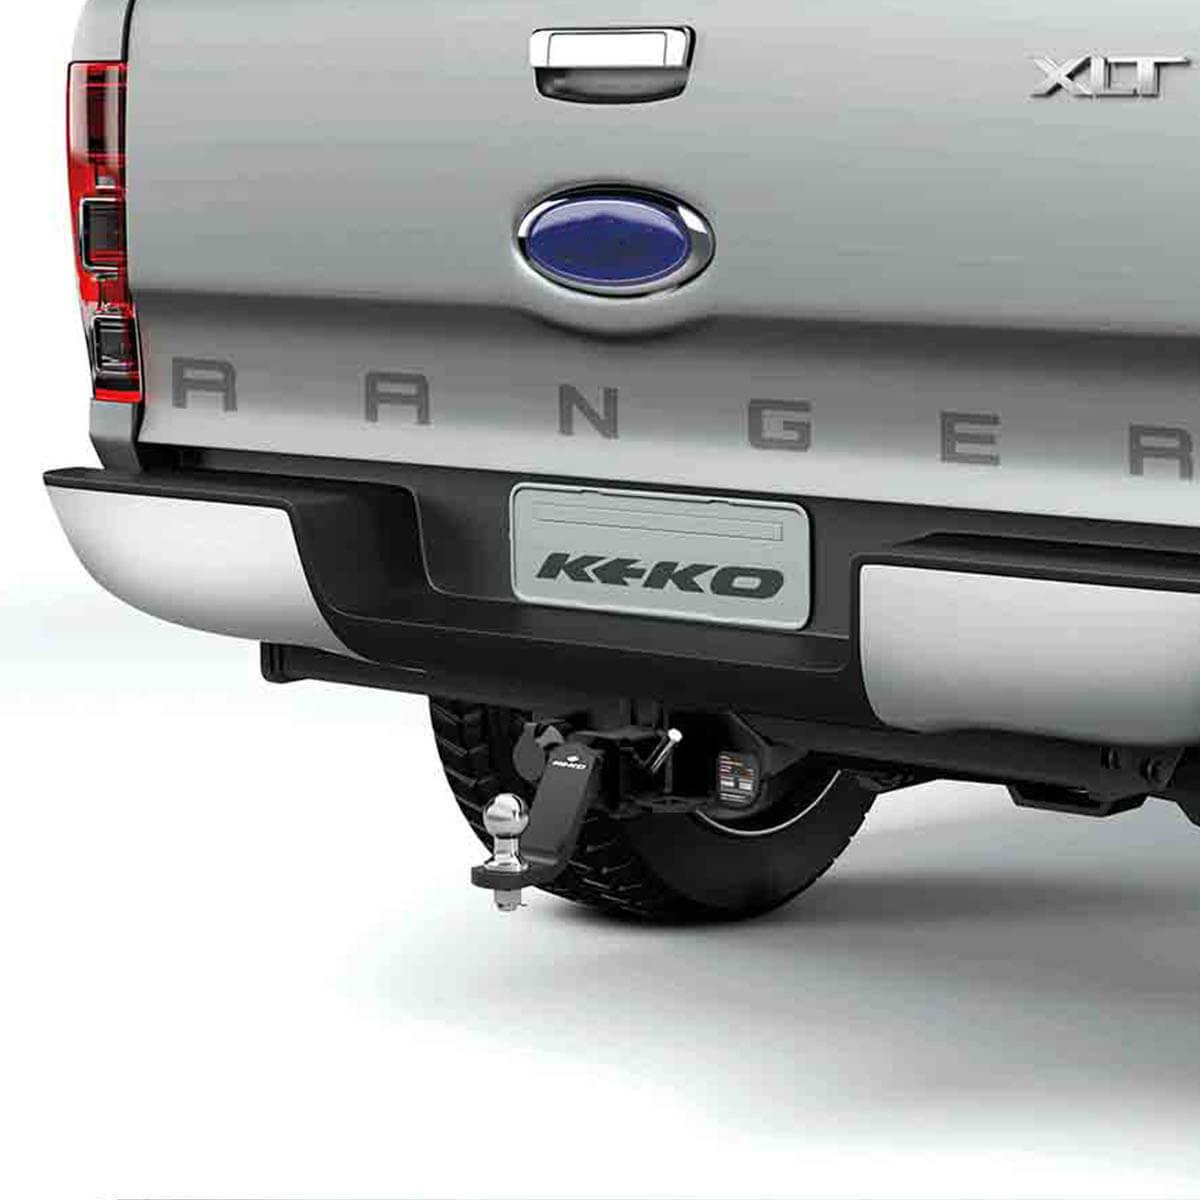 Engate de reboque removível Keko K1 Nova Ranger 2013 a 2021